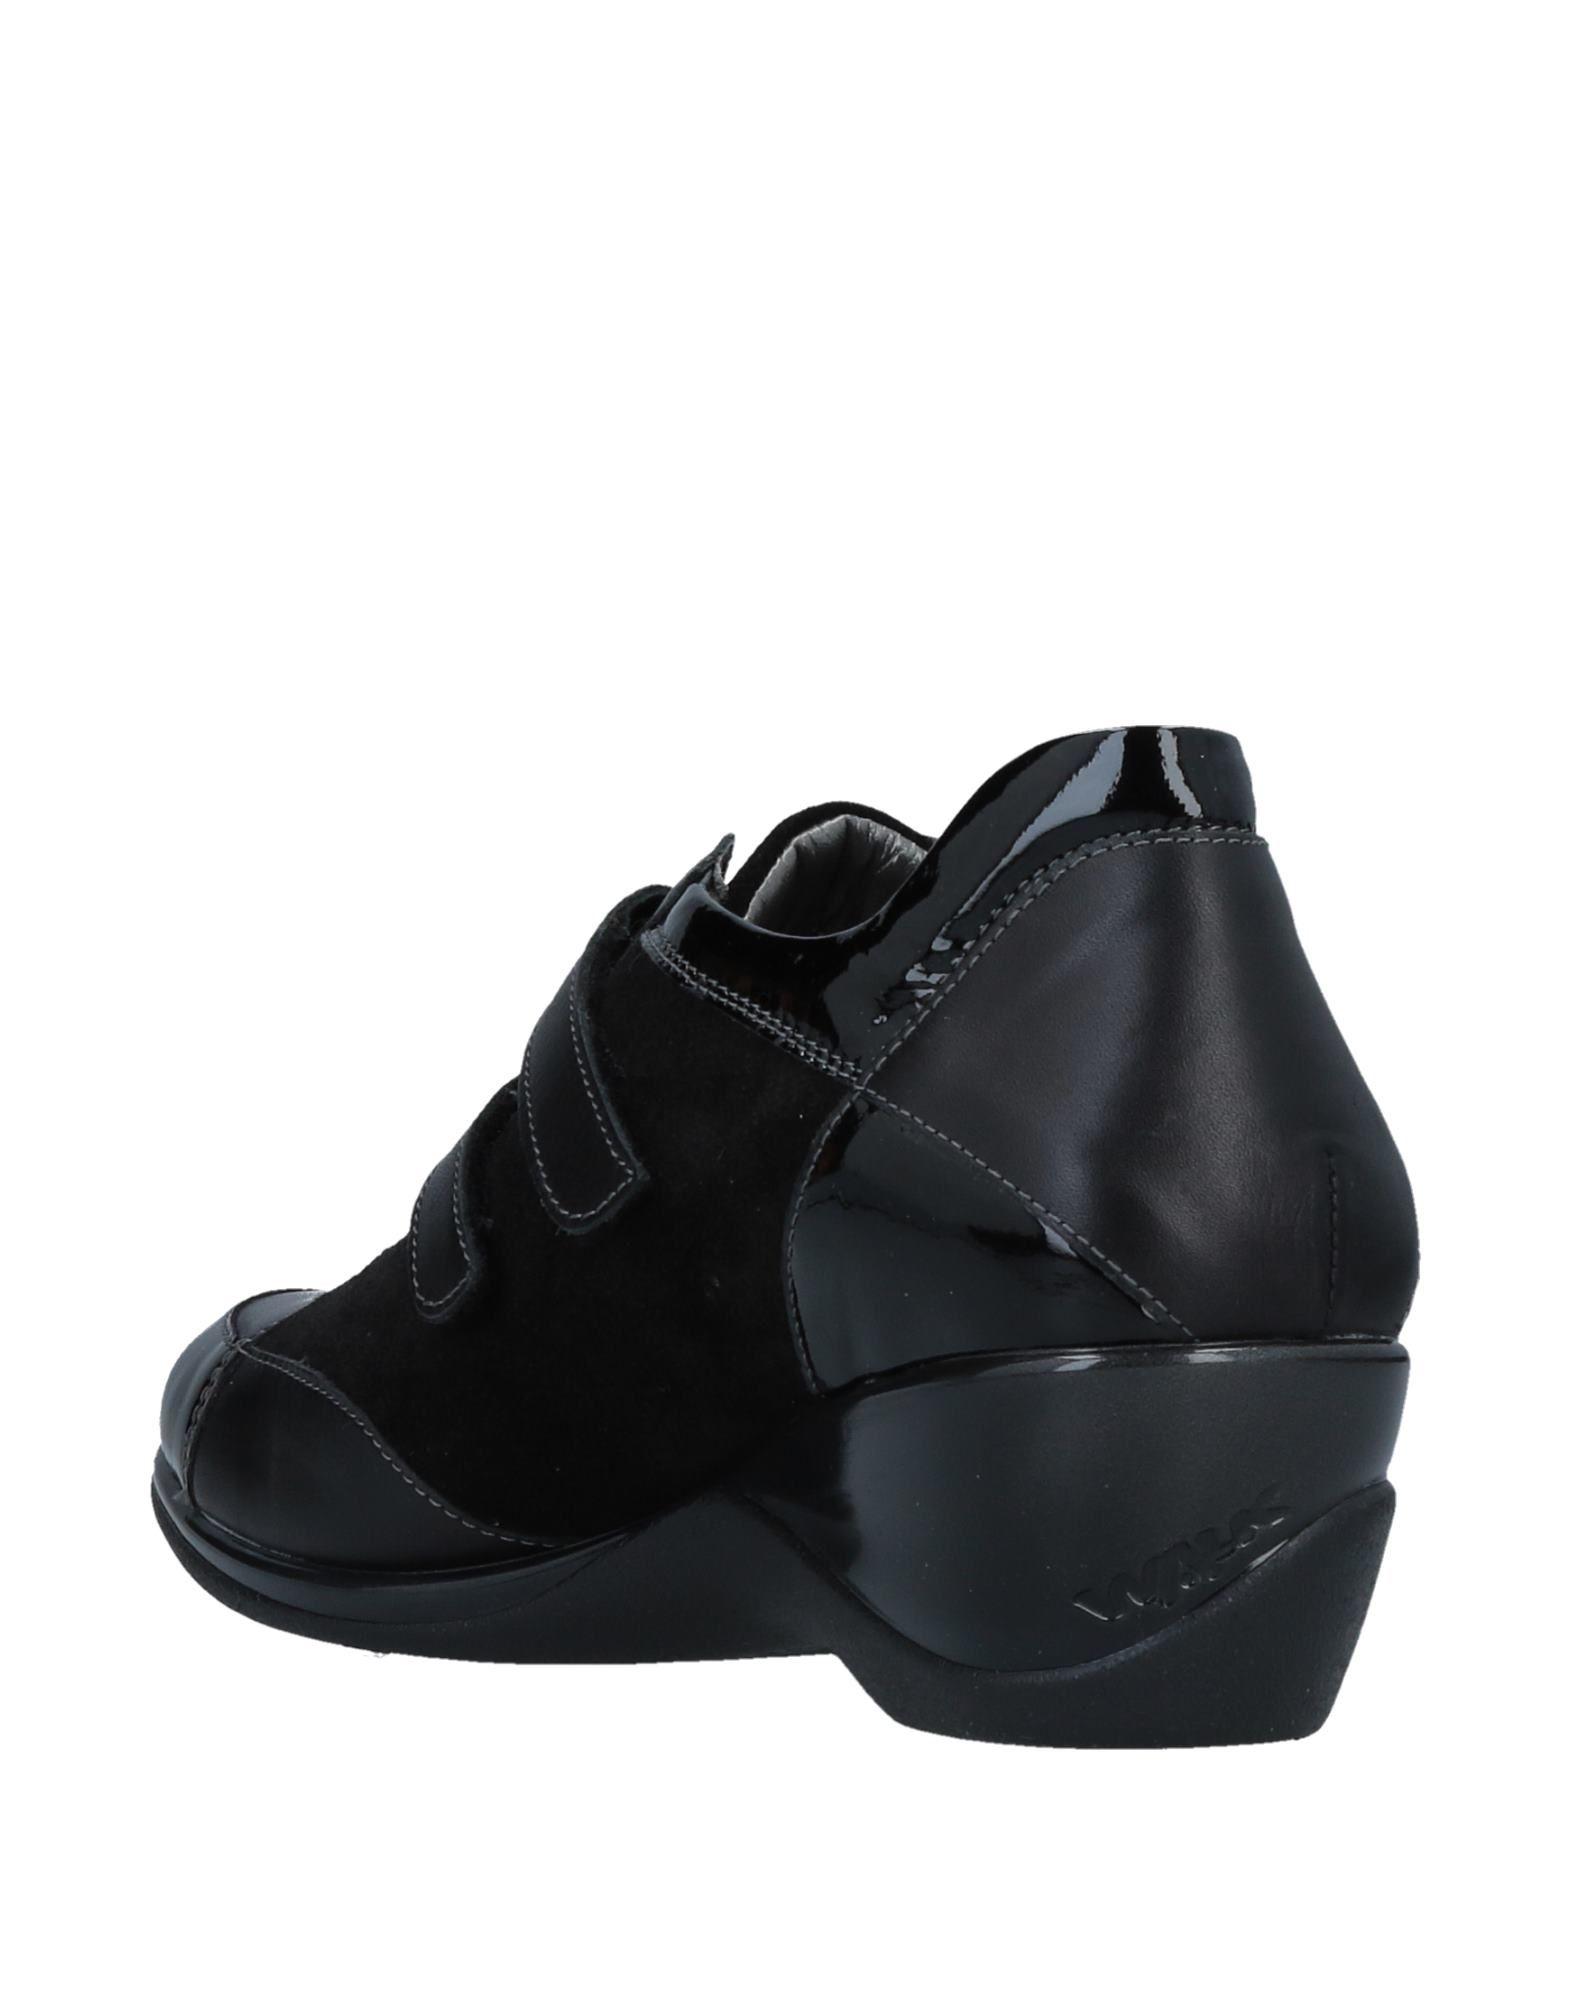 Walk Damen By Melluso Sneakers Damen Walk  11507298NI Neue Schuhe 31f46f